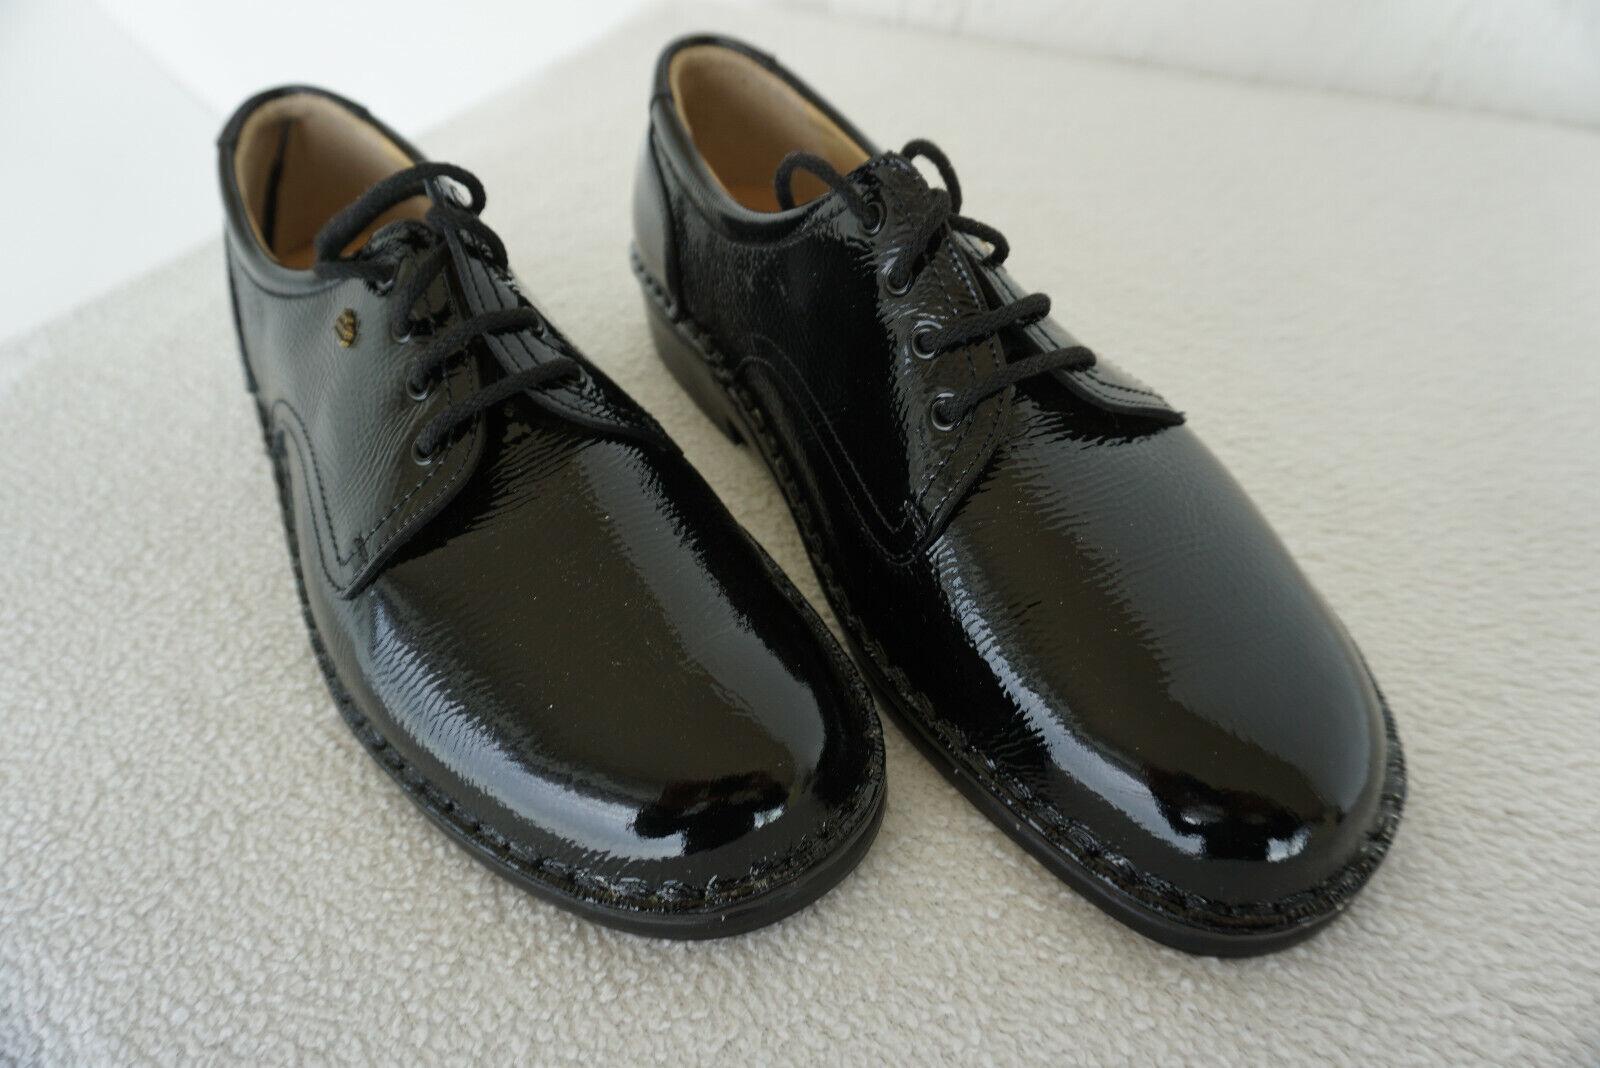 FINN COMFORT Colmar Herren Schuhe Schnürschuhe Gr.9   43 schwarz Lack Leder NEU